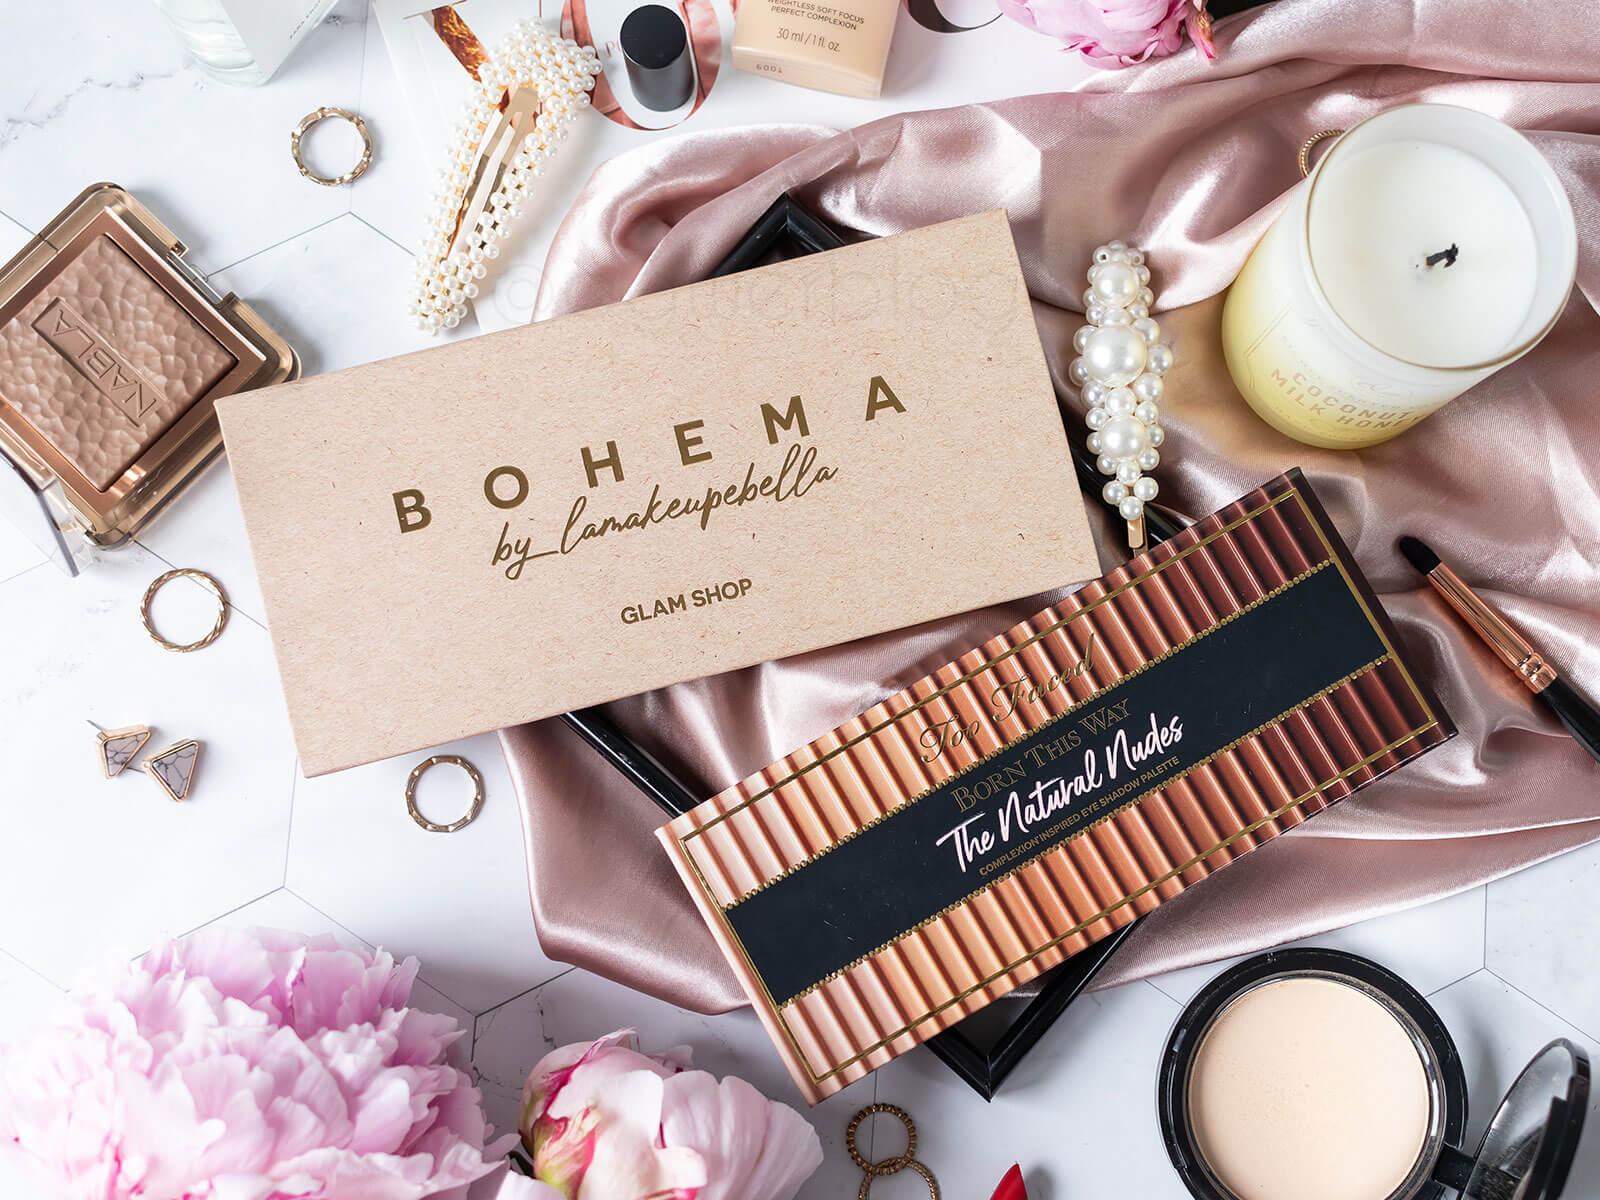 Glam shop Bohema vs. Too Faced The Natural Nudes